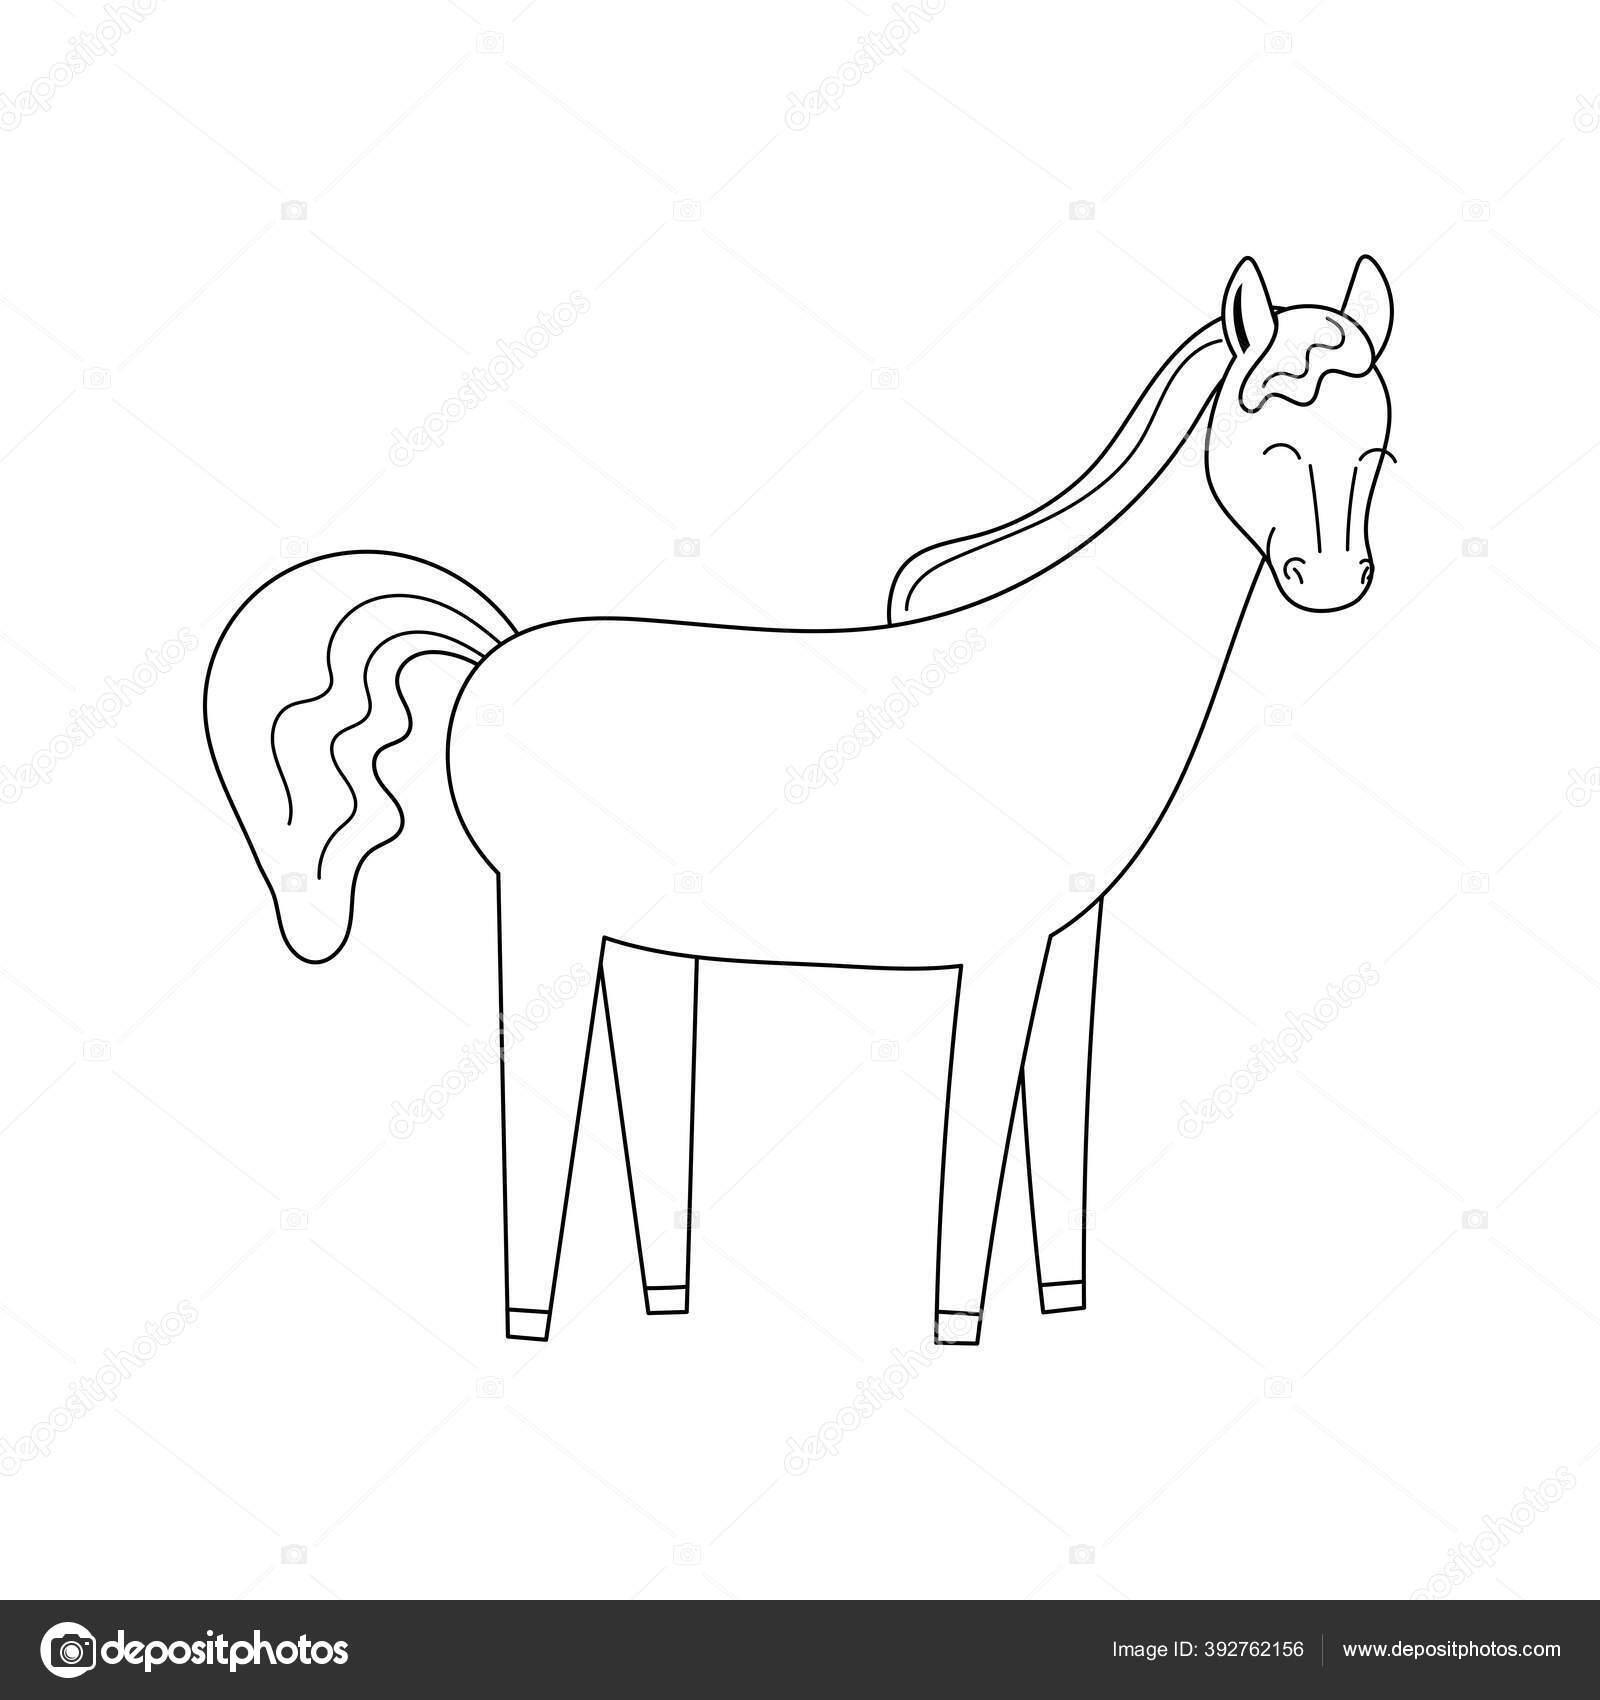 Cute Contour Doodle Horse Horseback Riding Illustration Childrens Coloring Book Stock Vector C Lisi Note Yandex Ru 392762156